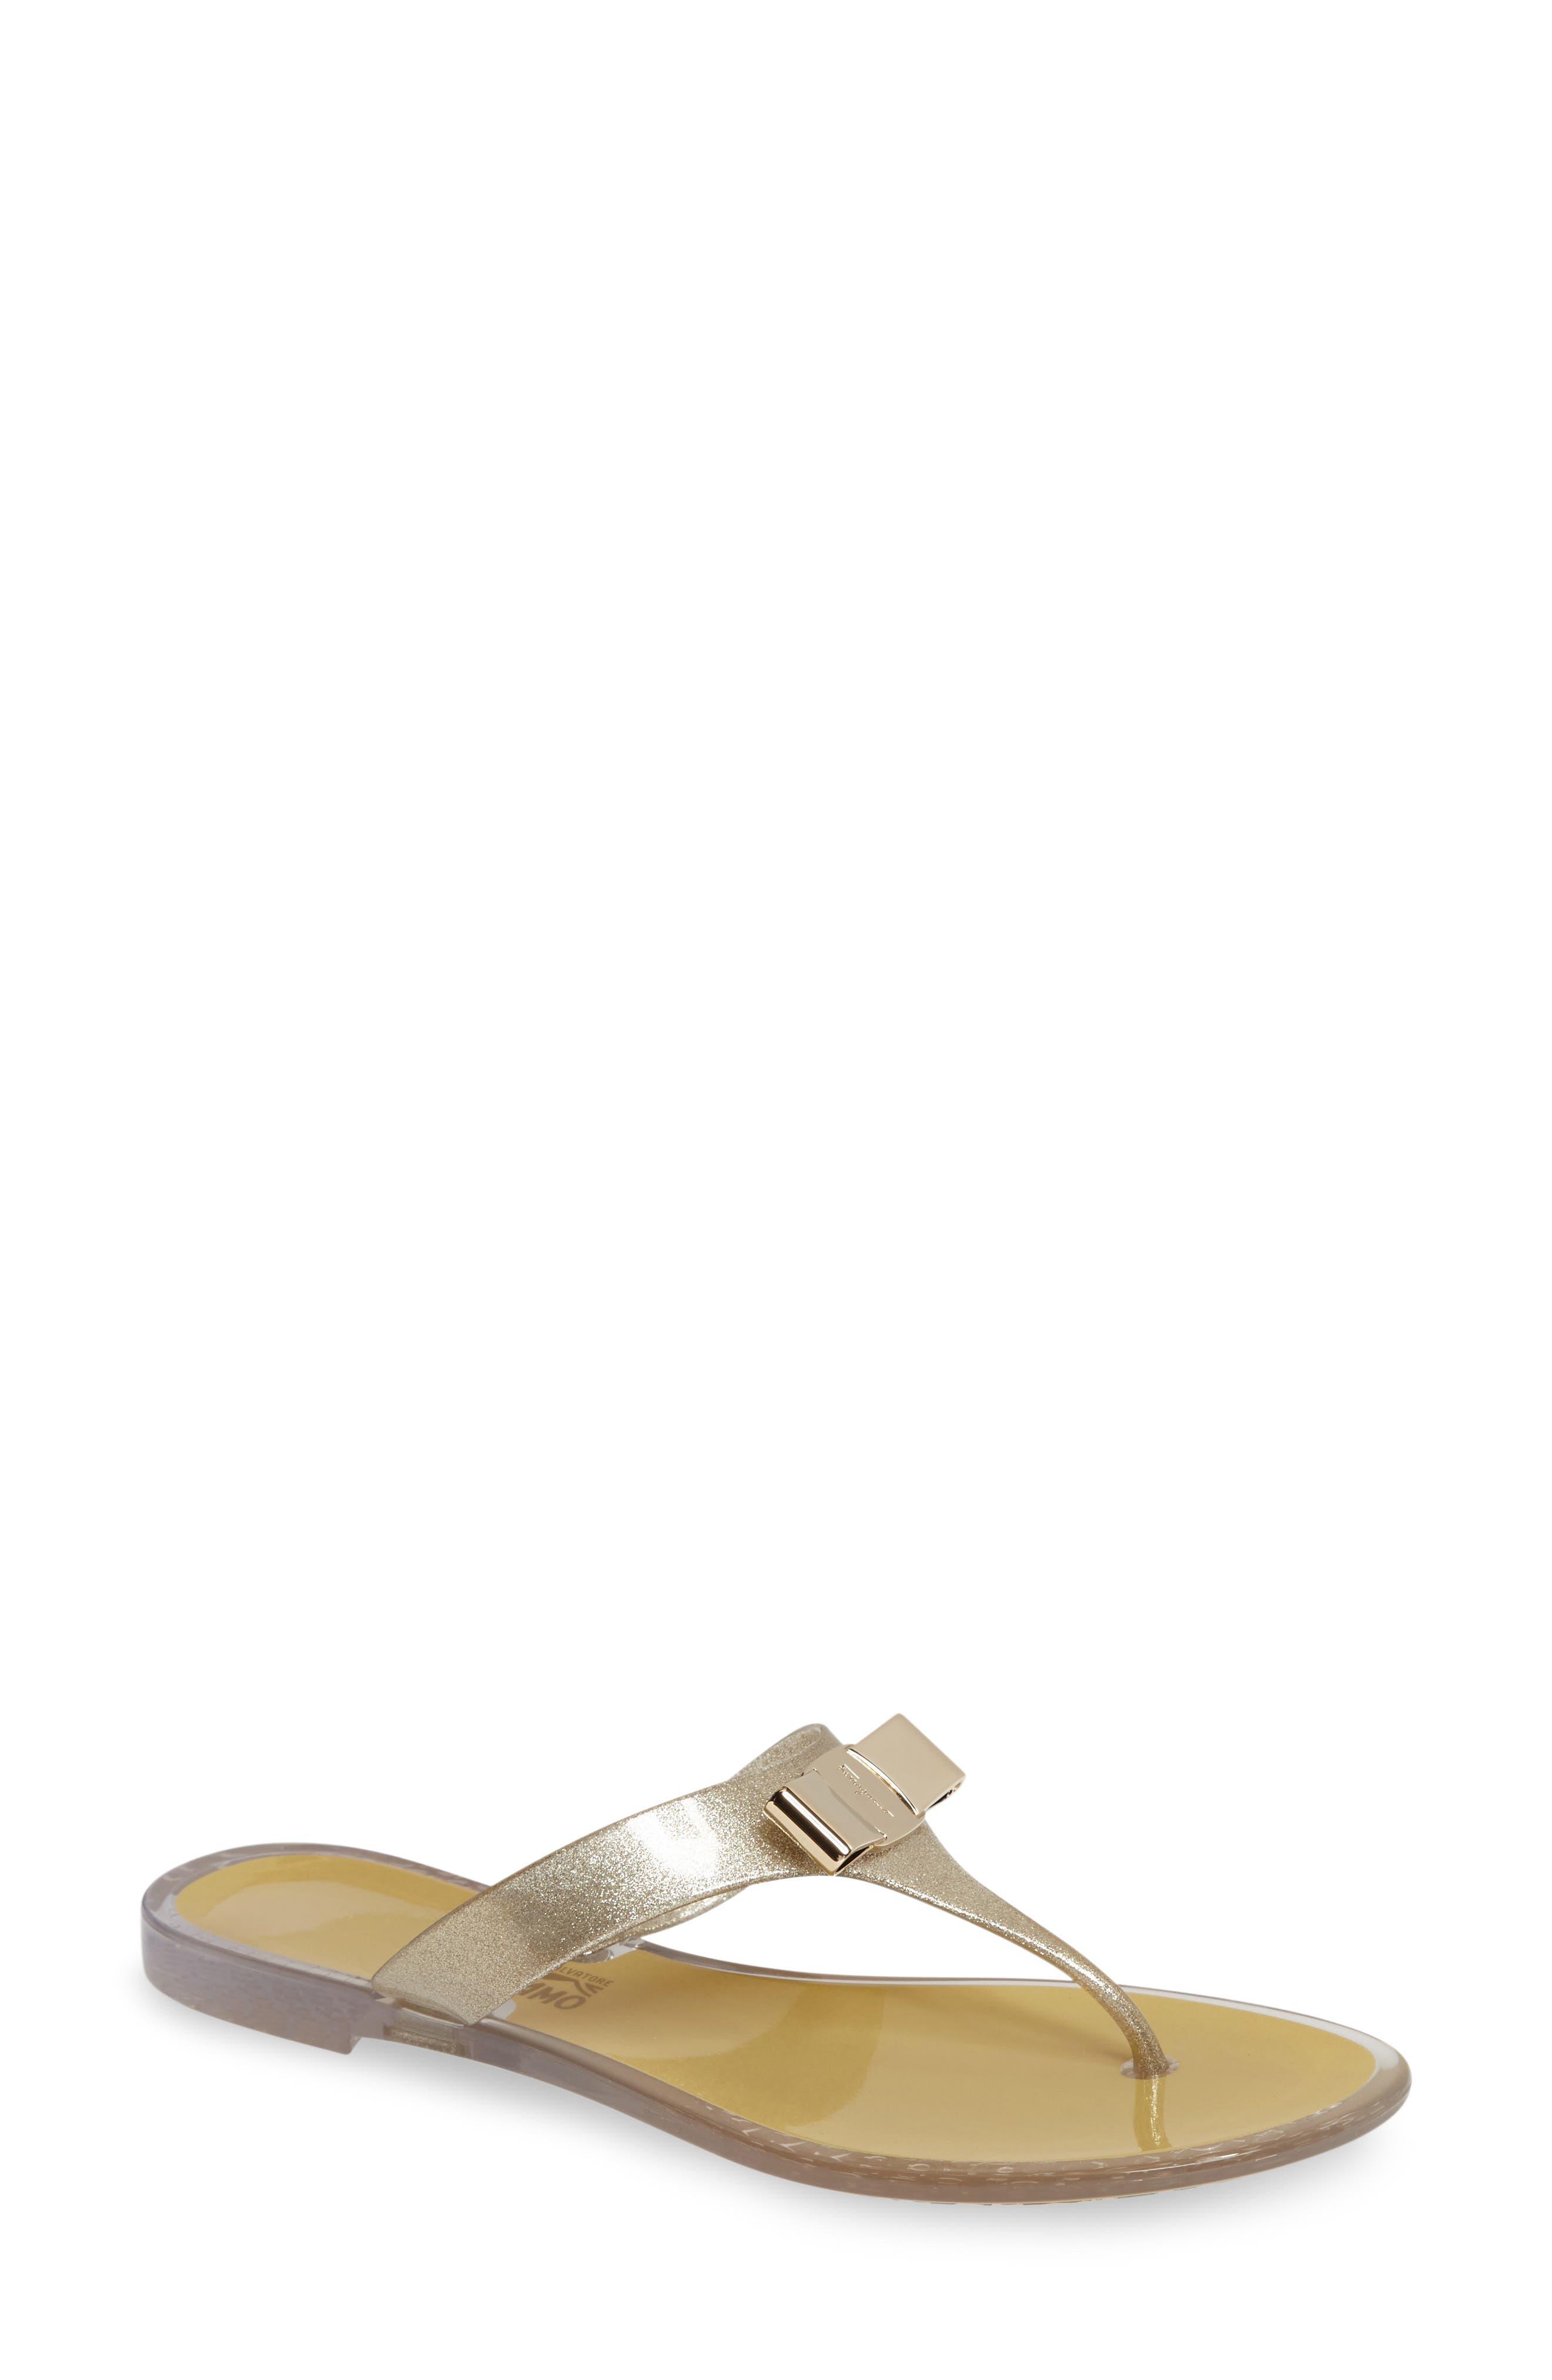 Jelly Flat Bow Sandal,                         Main,                         color, Beige Glitter Pvc